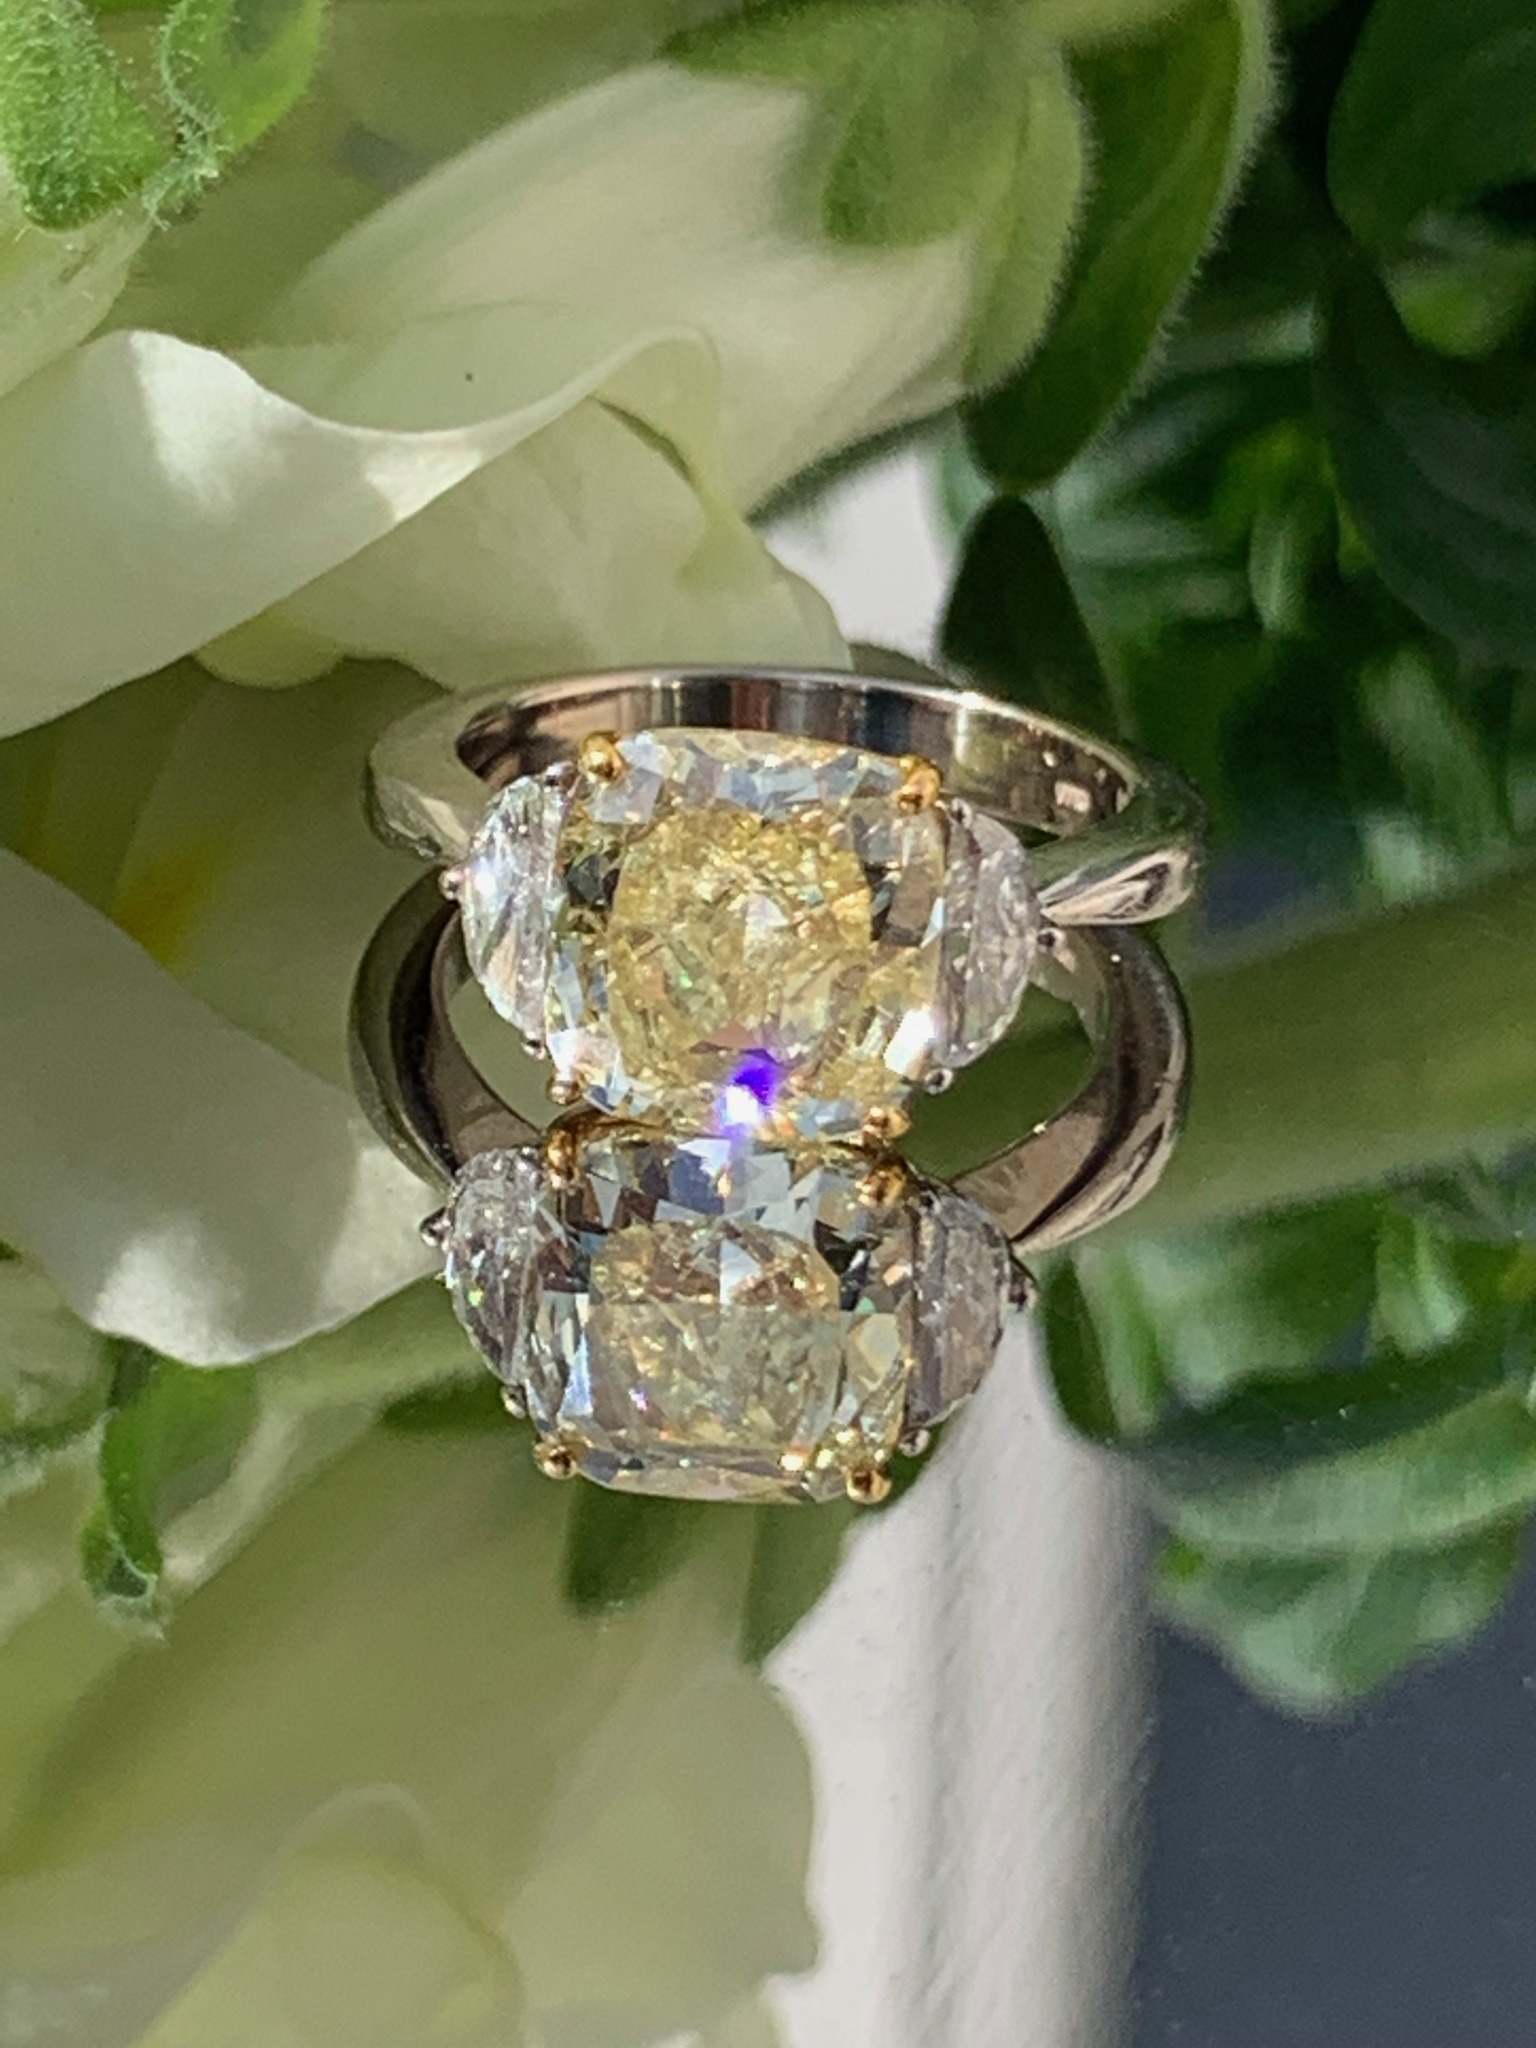 3.3 carat cushion cut yellow diamond set with 2 half moon shape diamonds on side